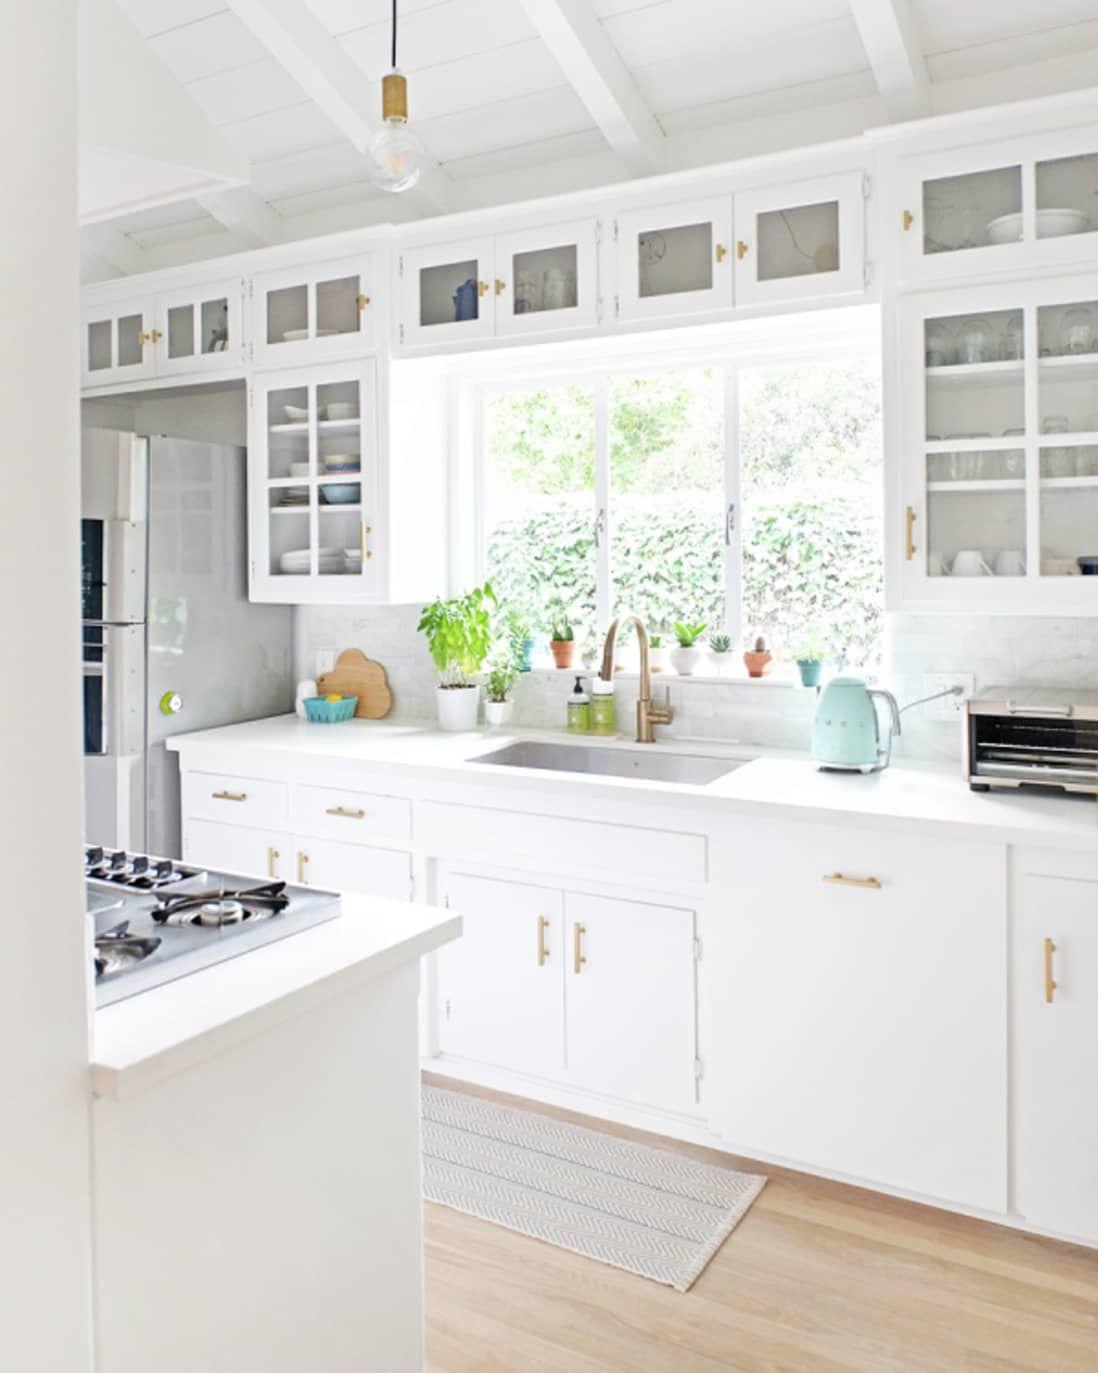 Glass Front Kitchen Cabinet Doors Aren't Just Beautiful ...